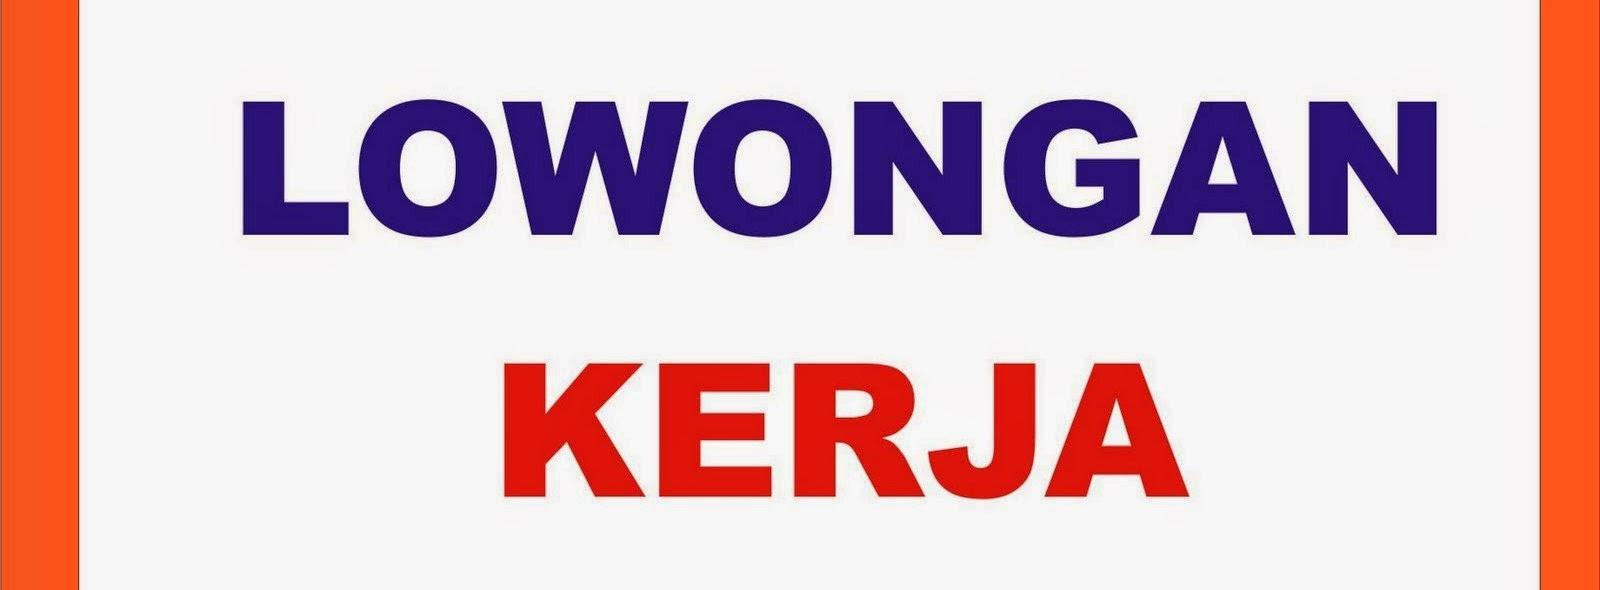 Lowongan Pekerjaan Smk Semarang